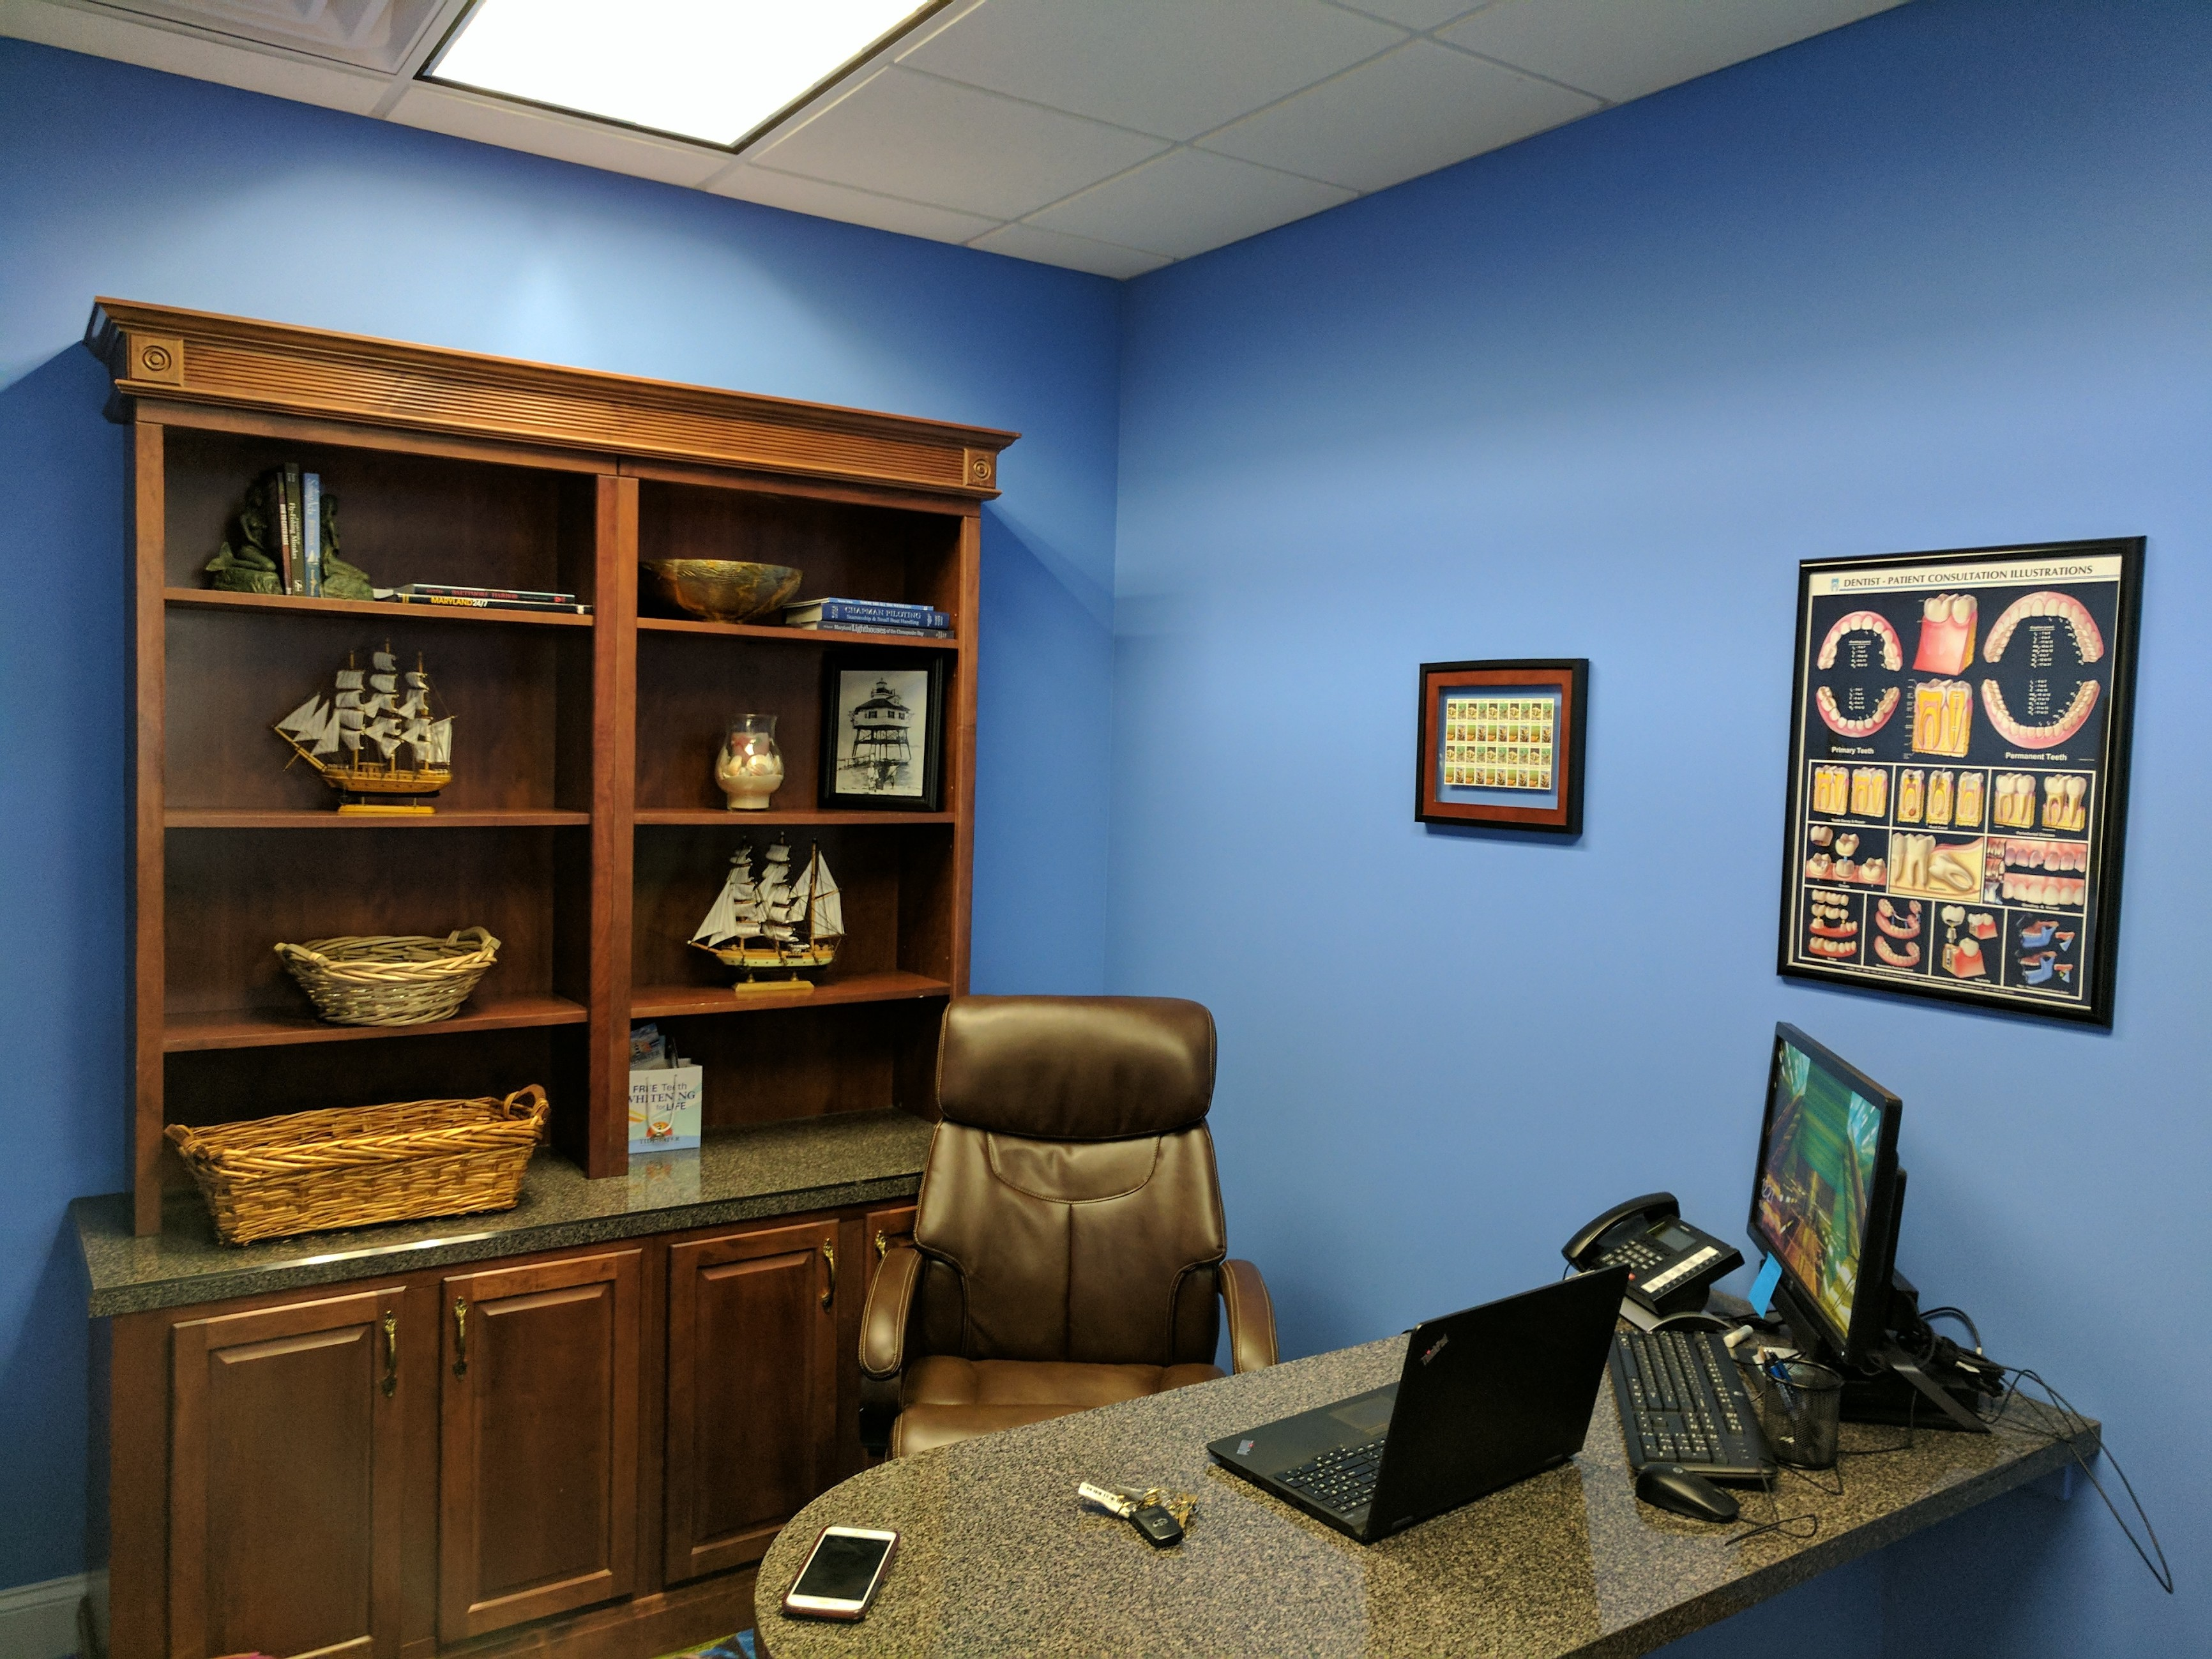 pf tidewater office